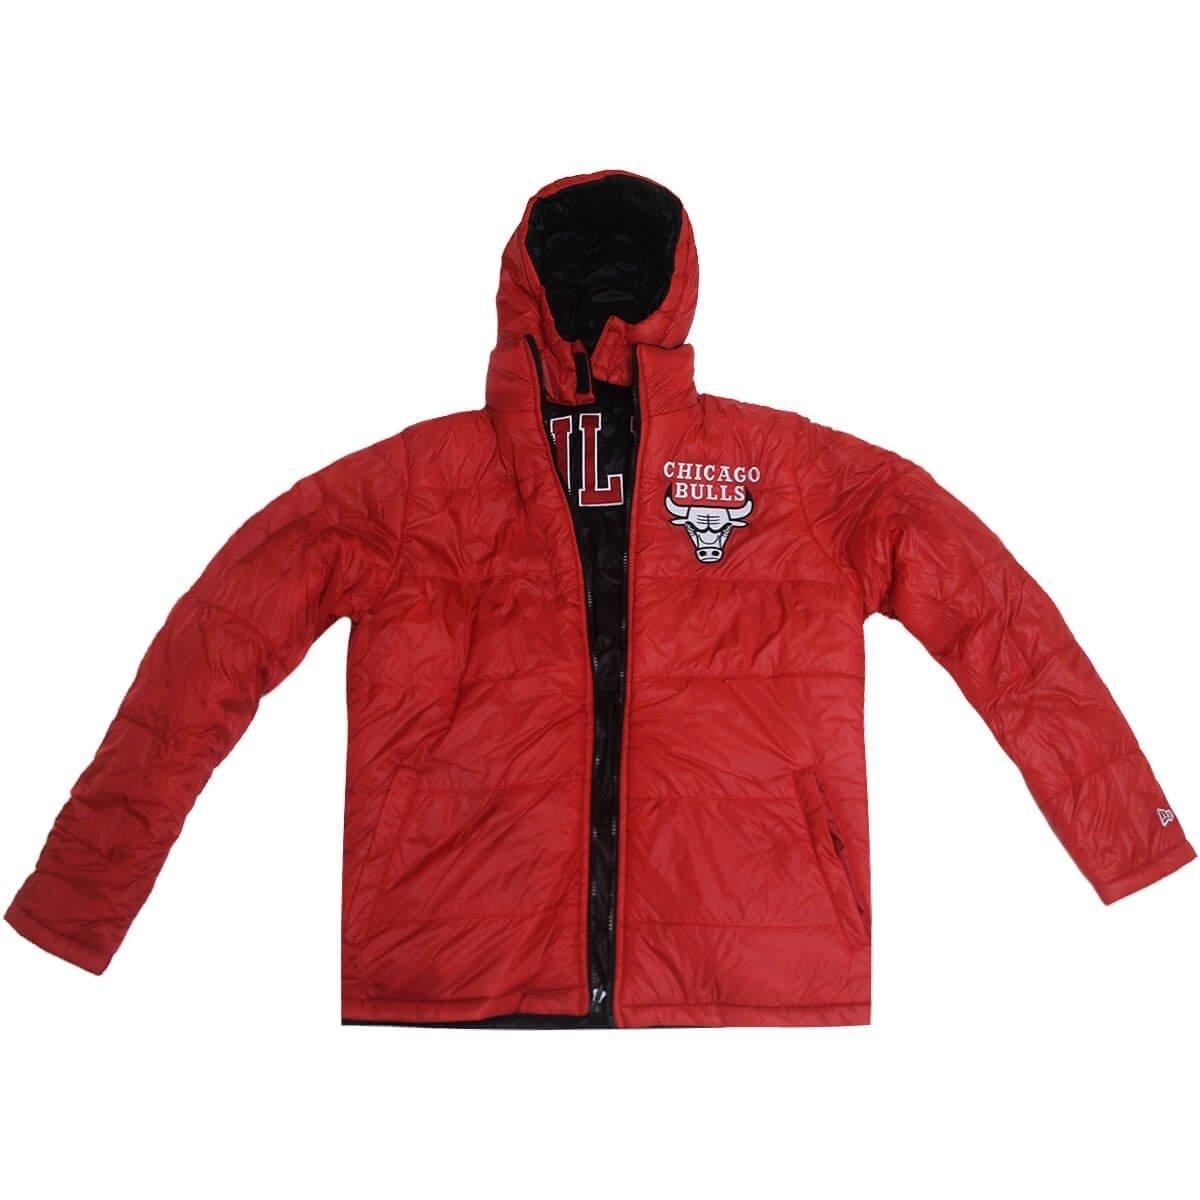 Jaqueta New Era Nba Chicago Bulls Bomber Dupla Fac - Compre Agora ... 4c57342c4a1